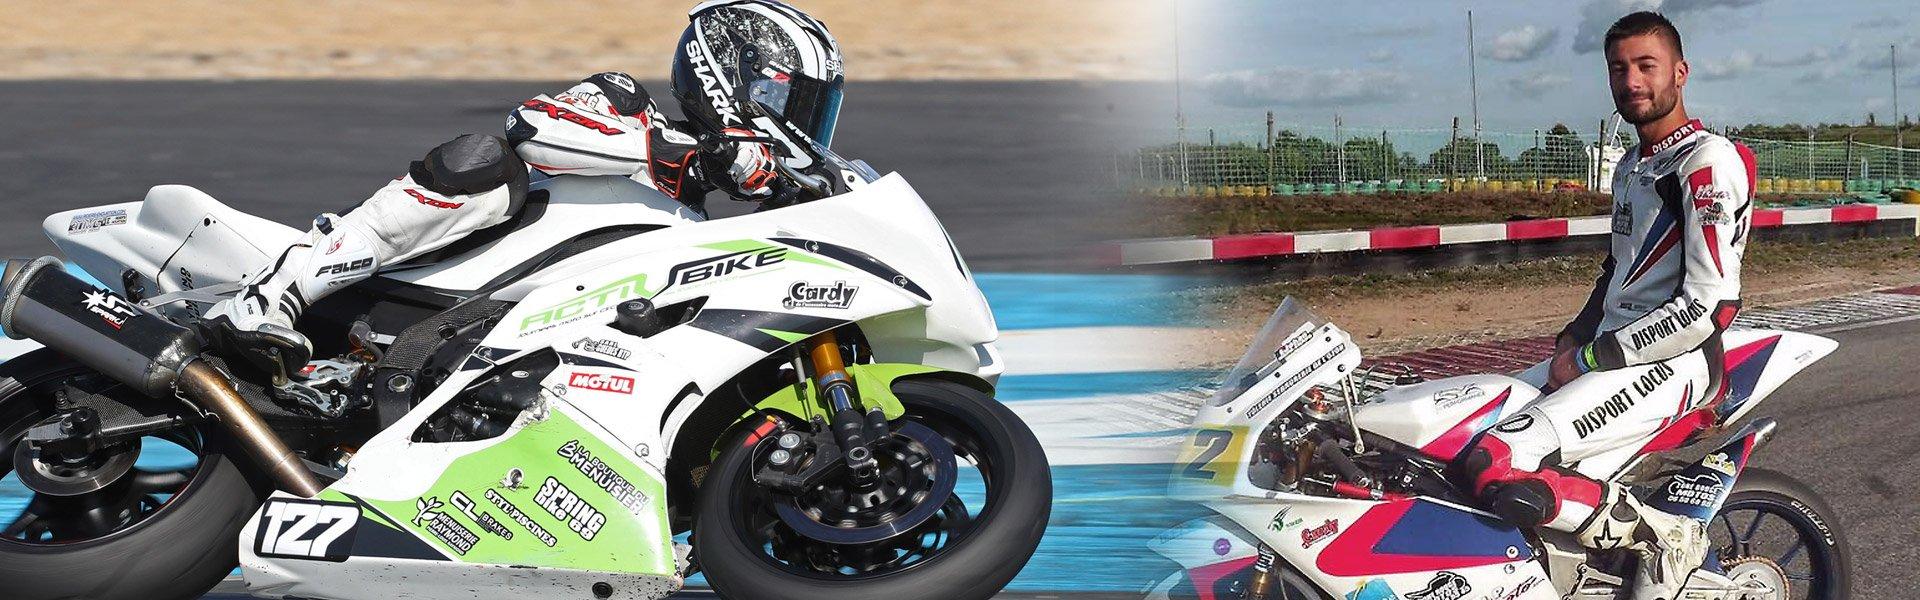 Pilotes sponsorisés cardy - Guillaume Raymond et Johan Wang Chang